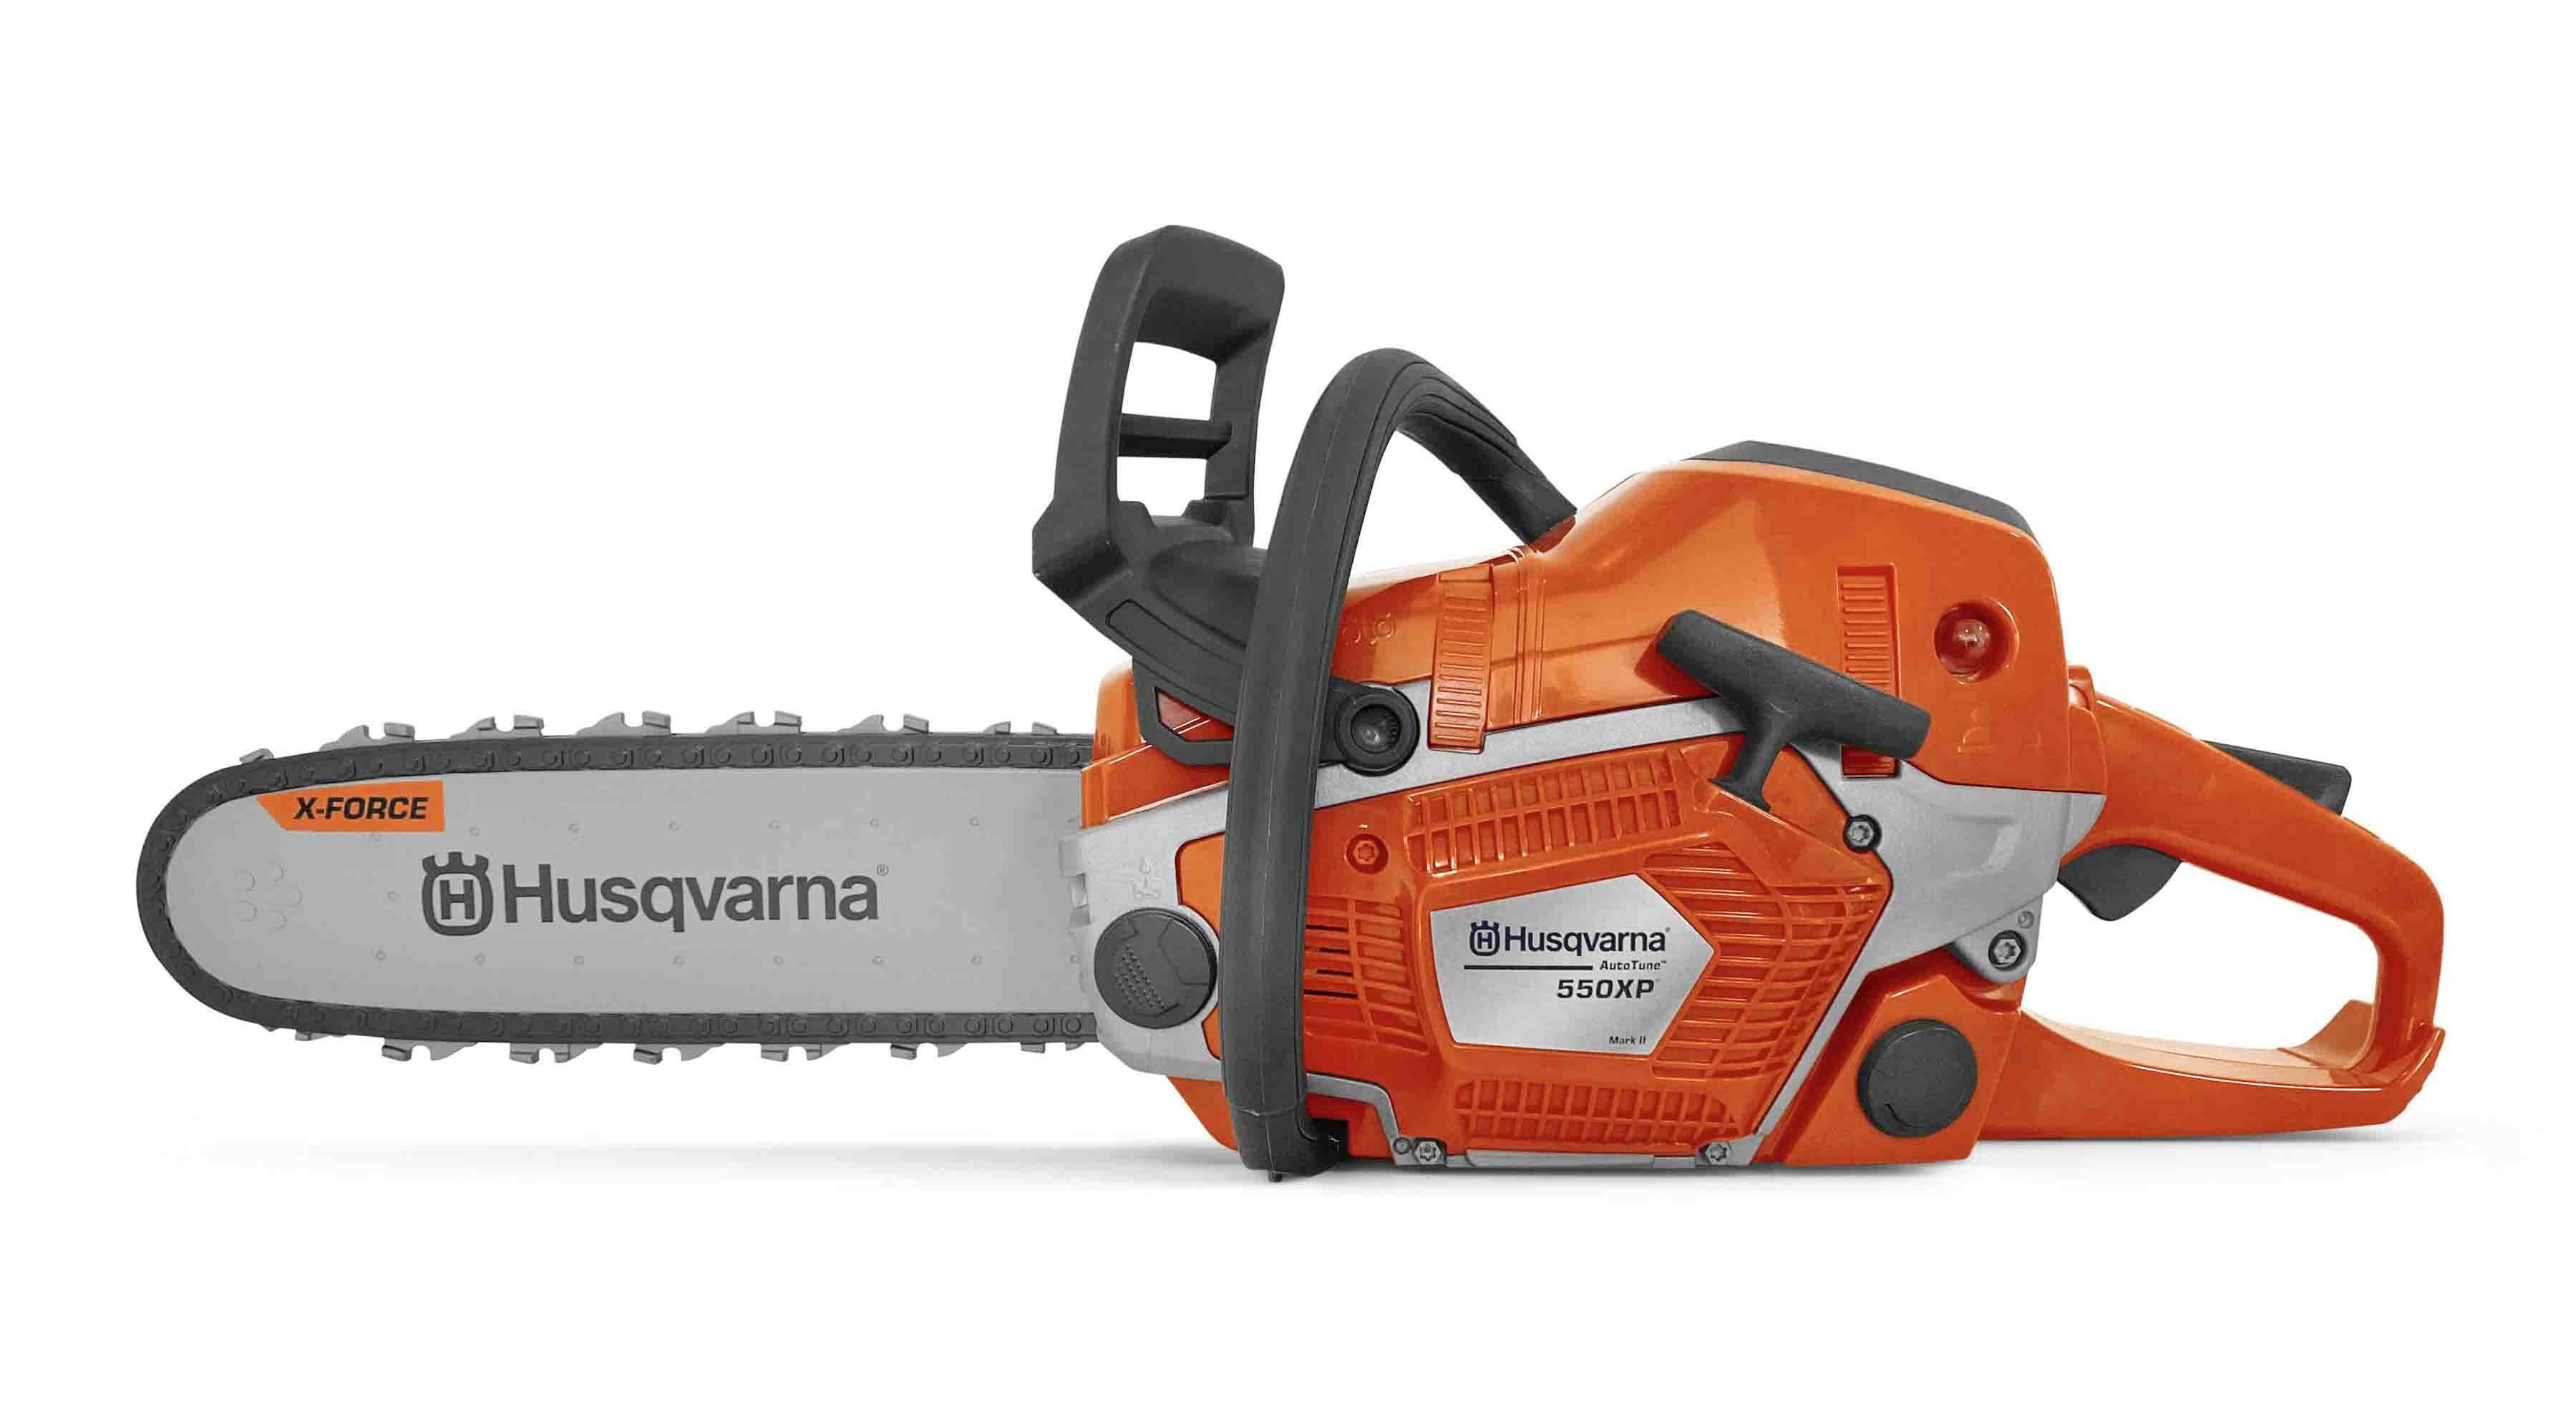 Husqvarna Childrens Toy 550XP Chain Saw